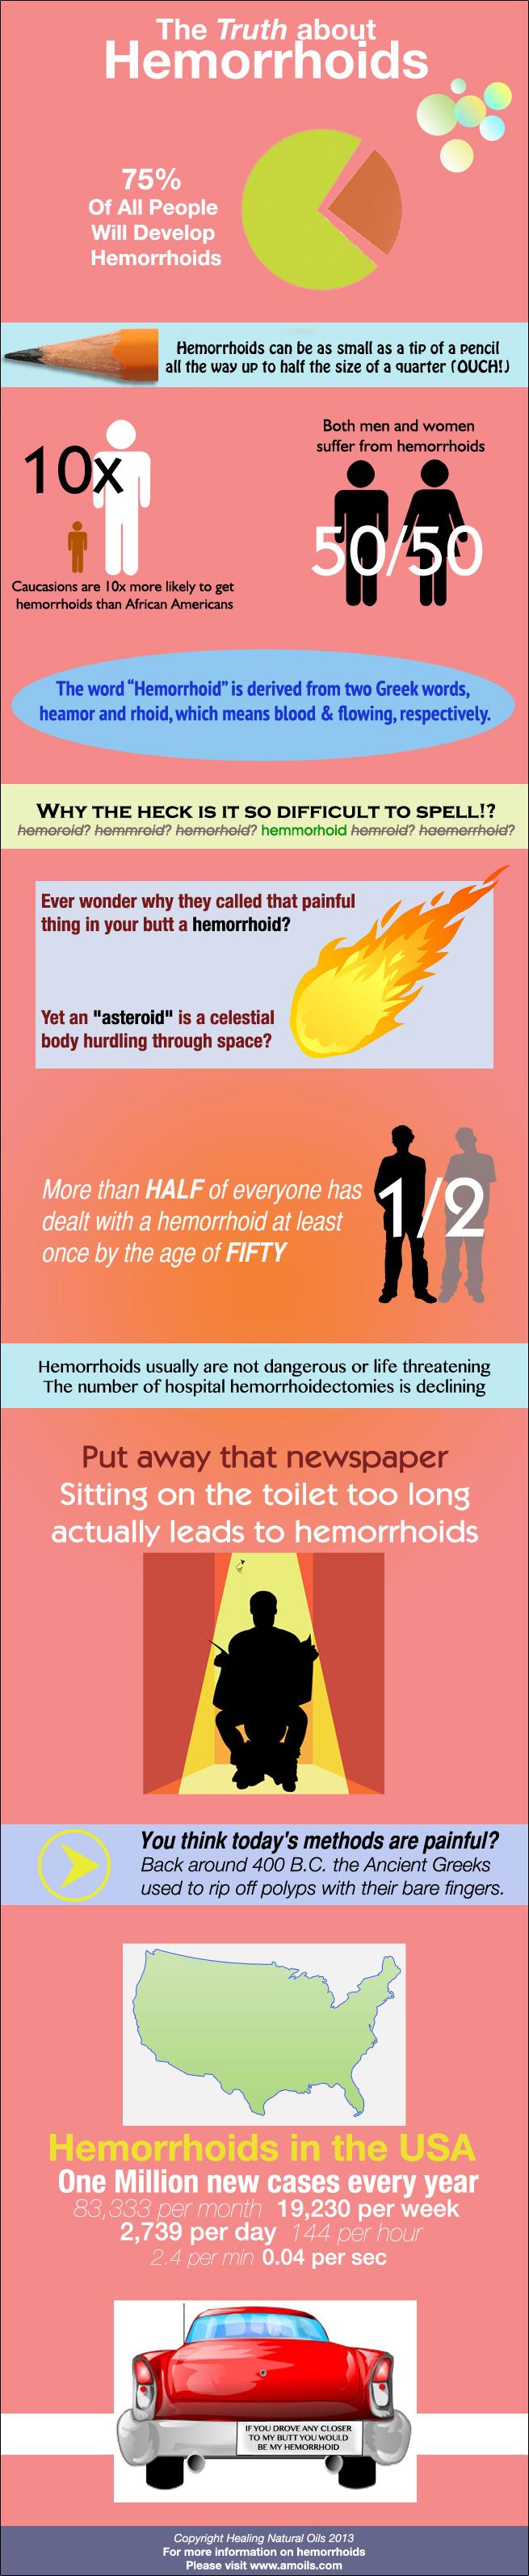 Hemorrhoids Infographic